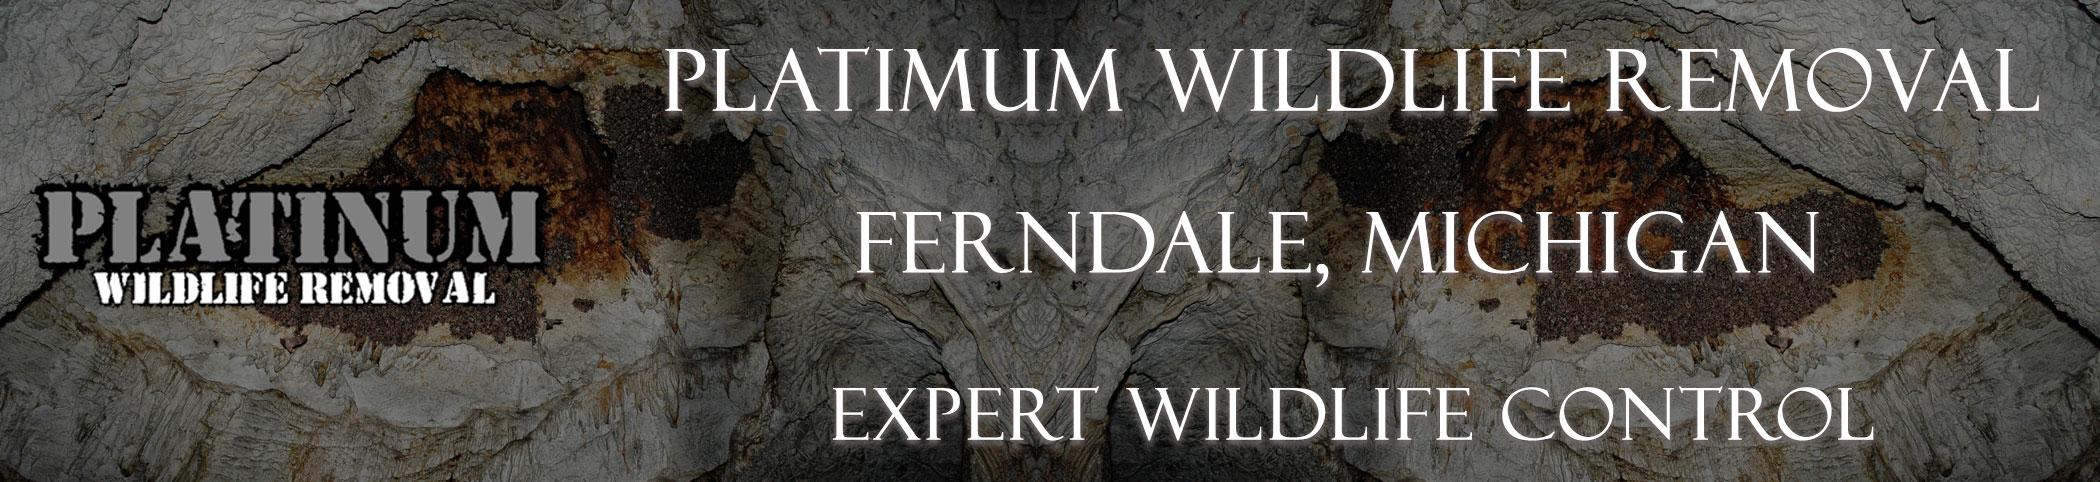 Ferndale-Platinum-Wildlife-Removal-michgan